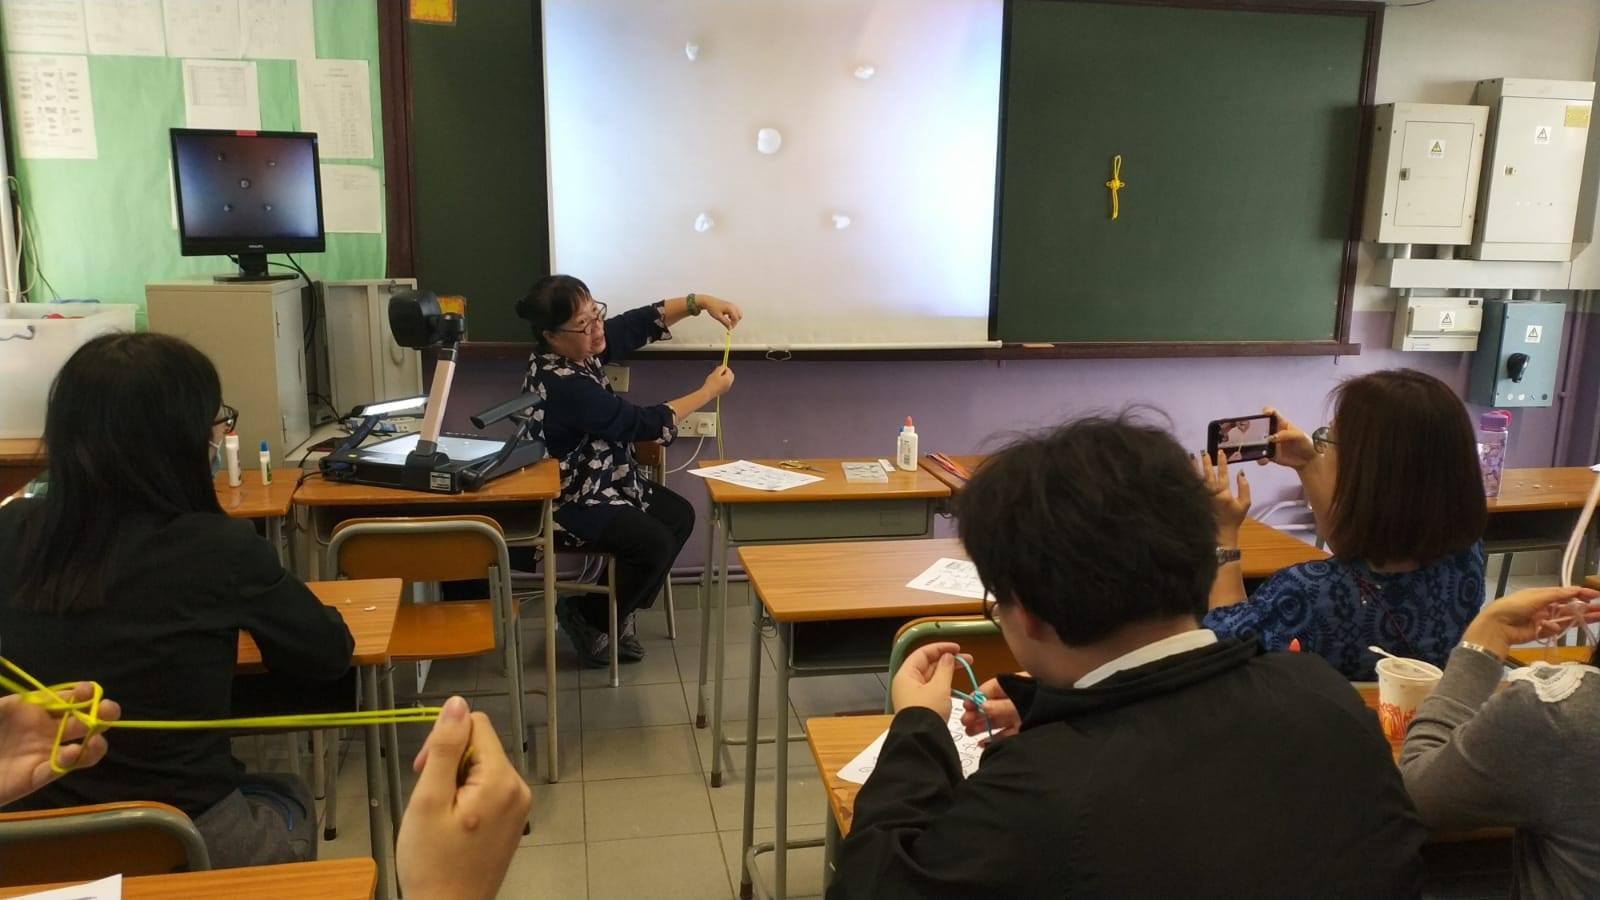 Rope teaching